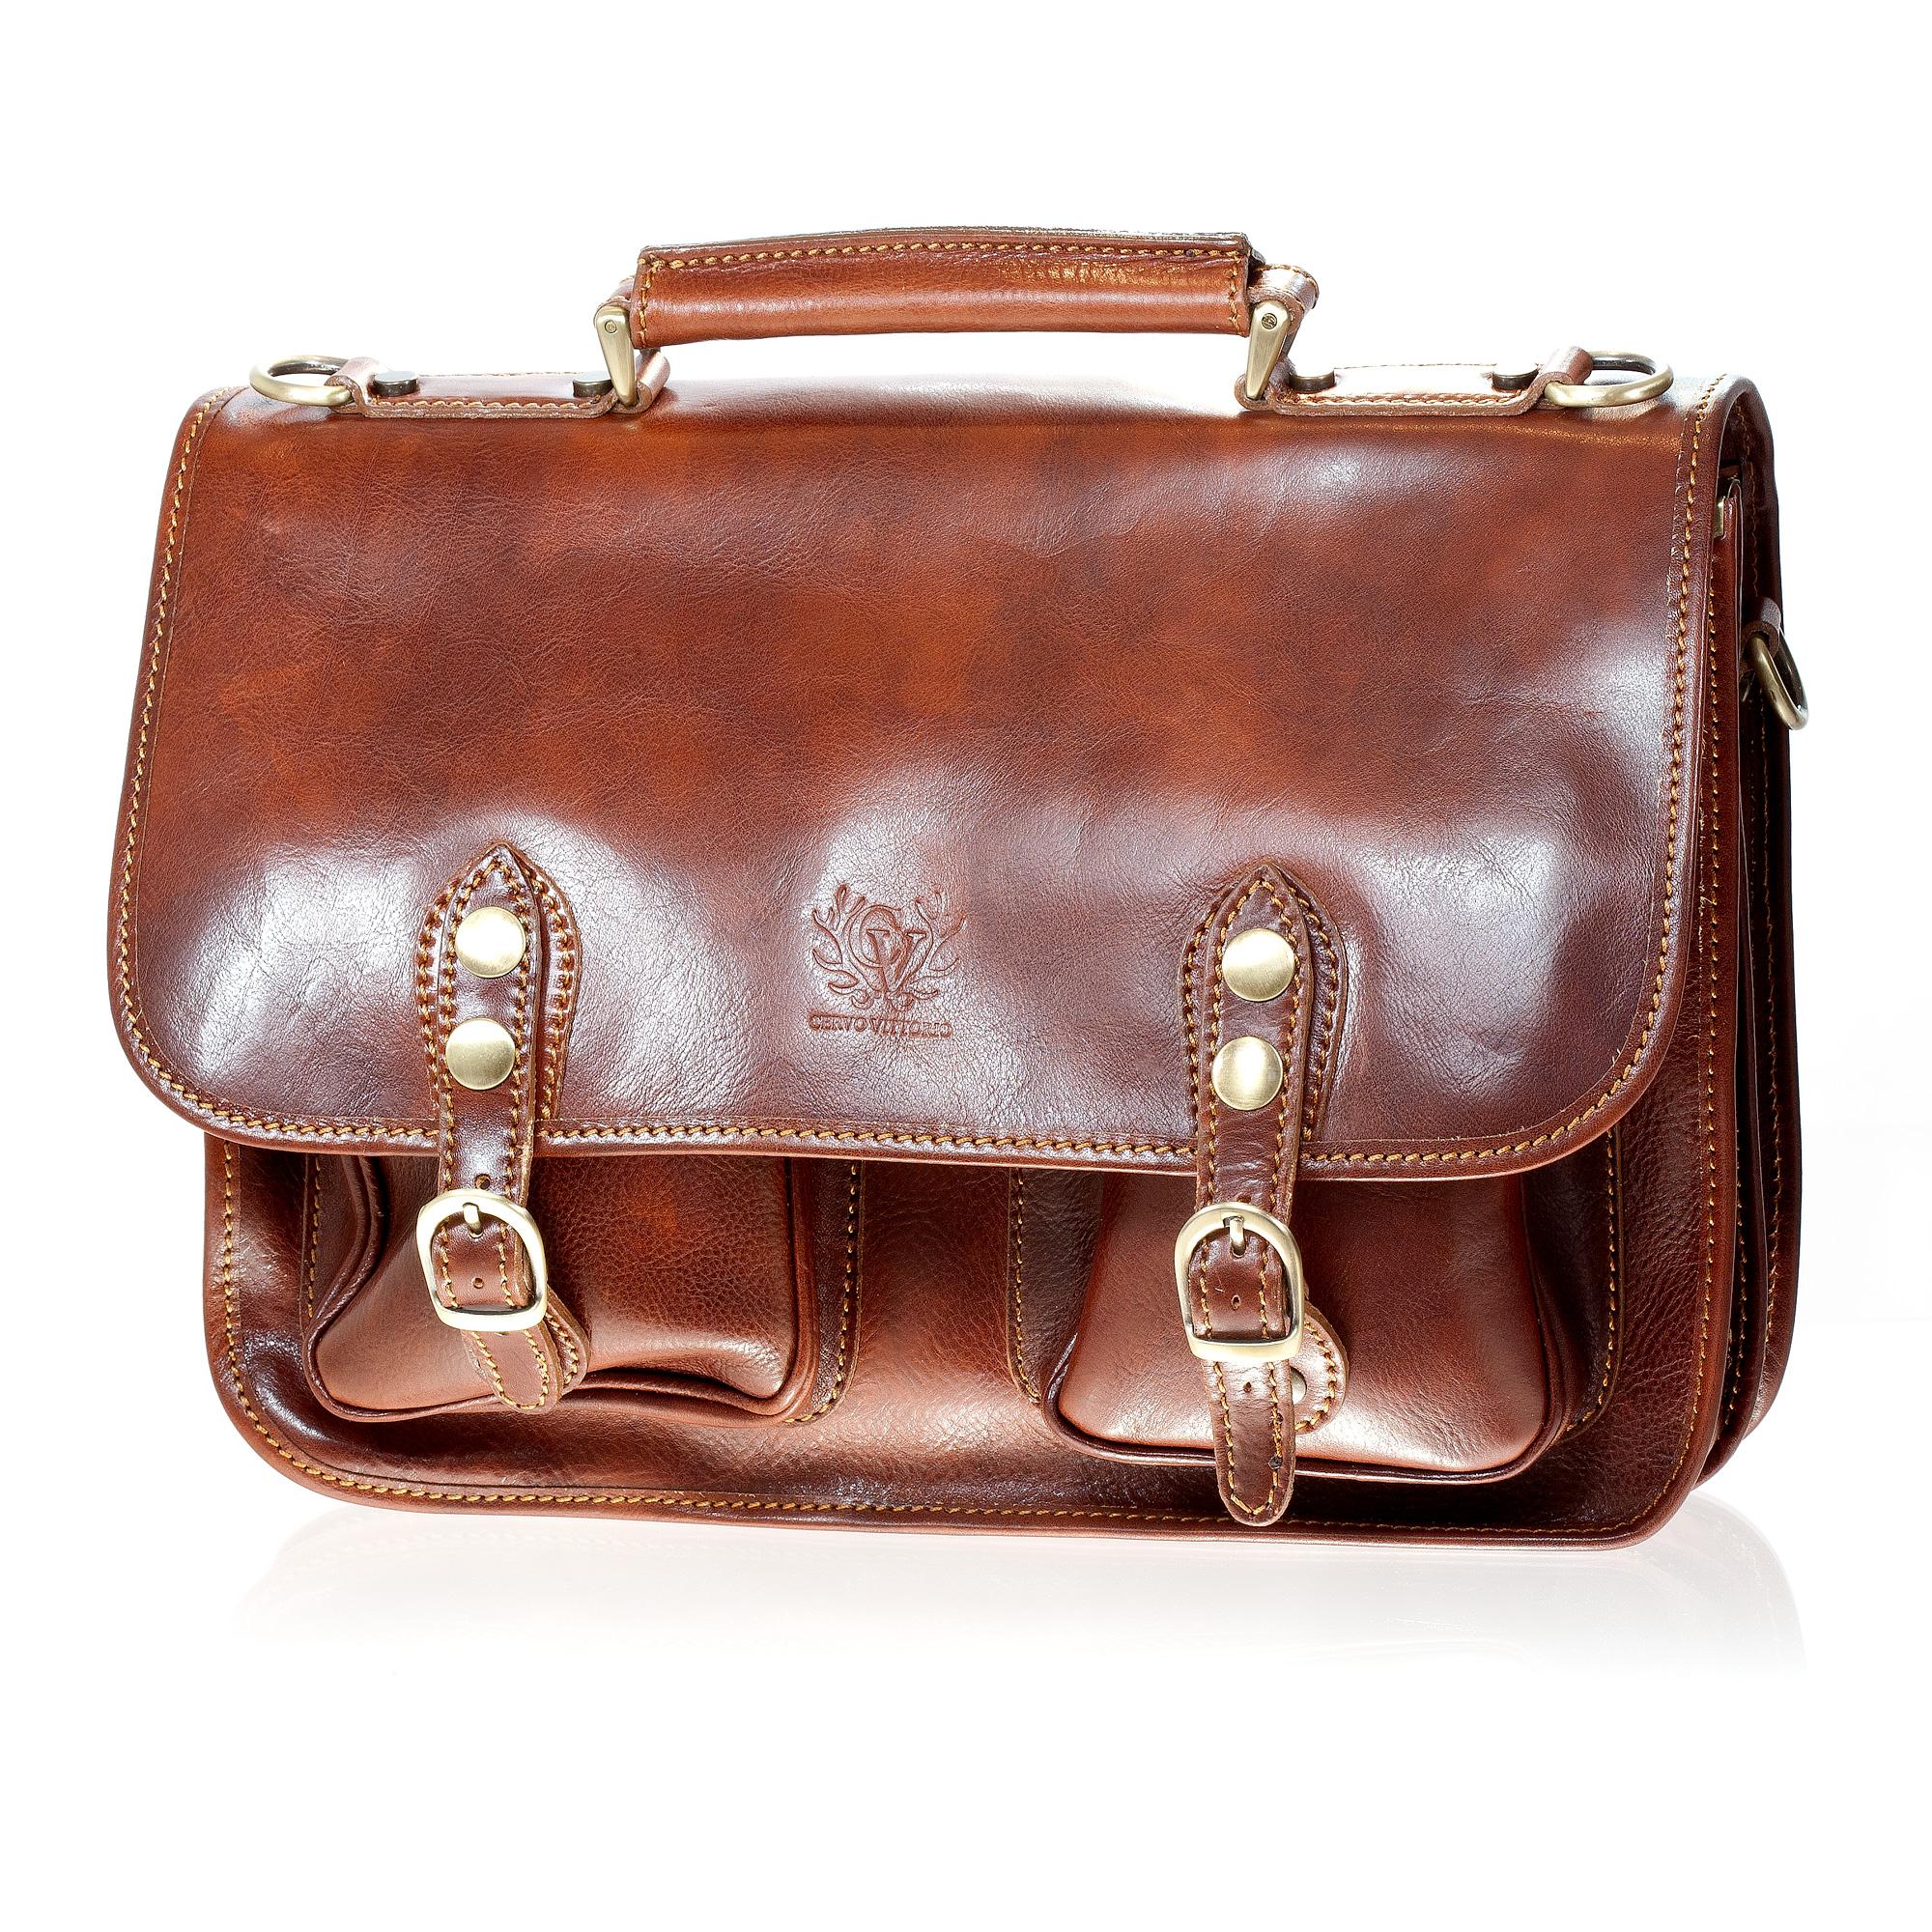 Cervo Vittorio Leather Messenger Bag, Cognac